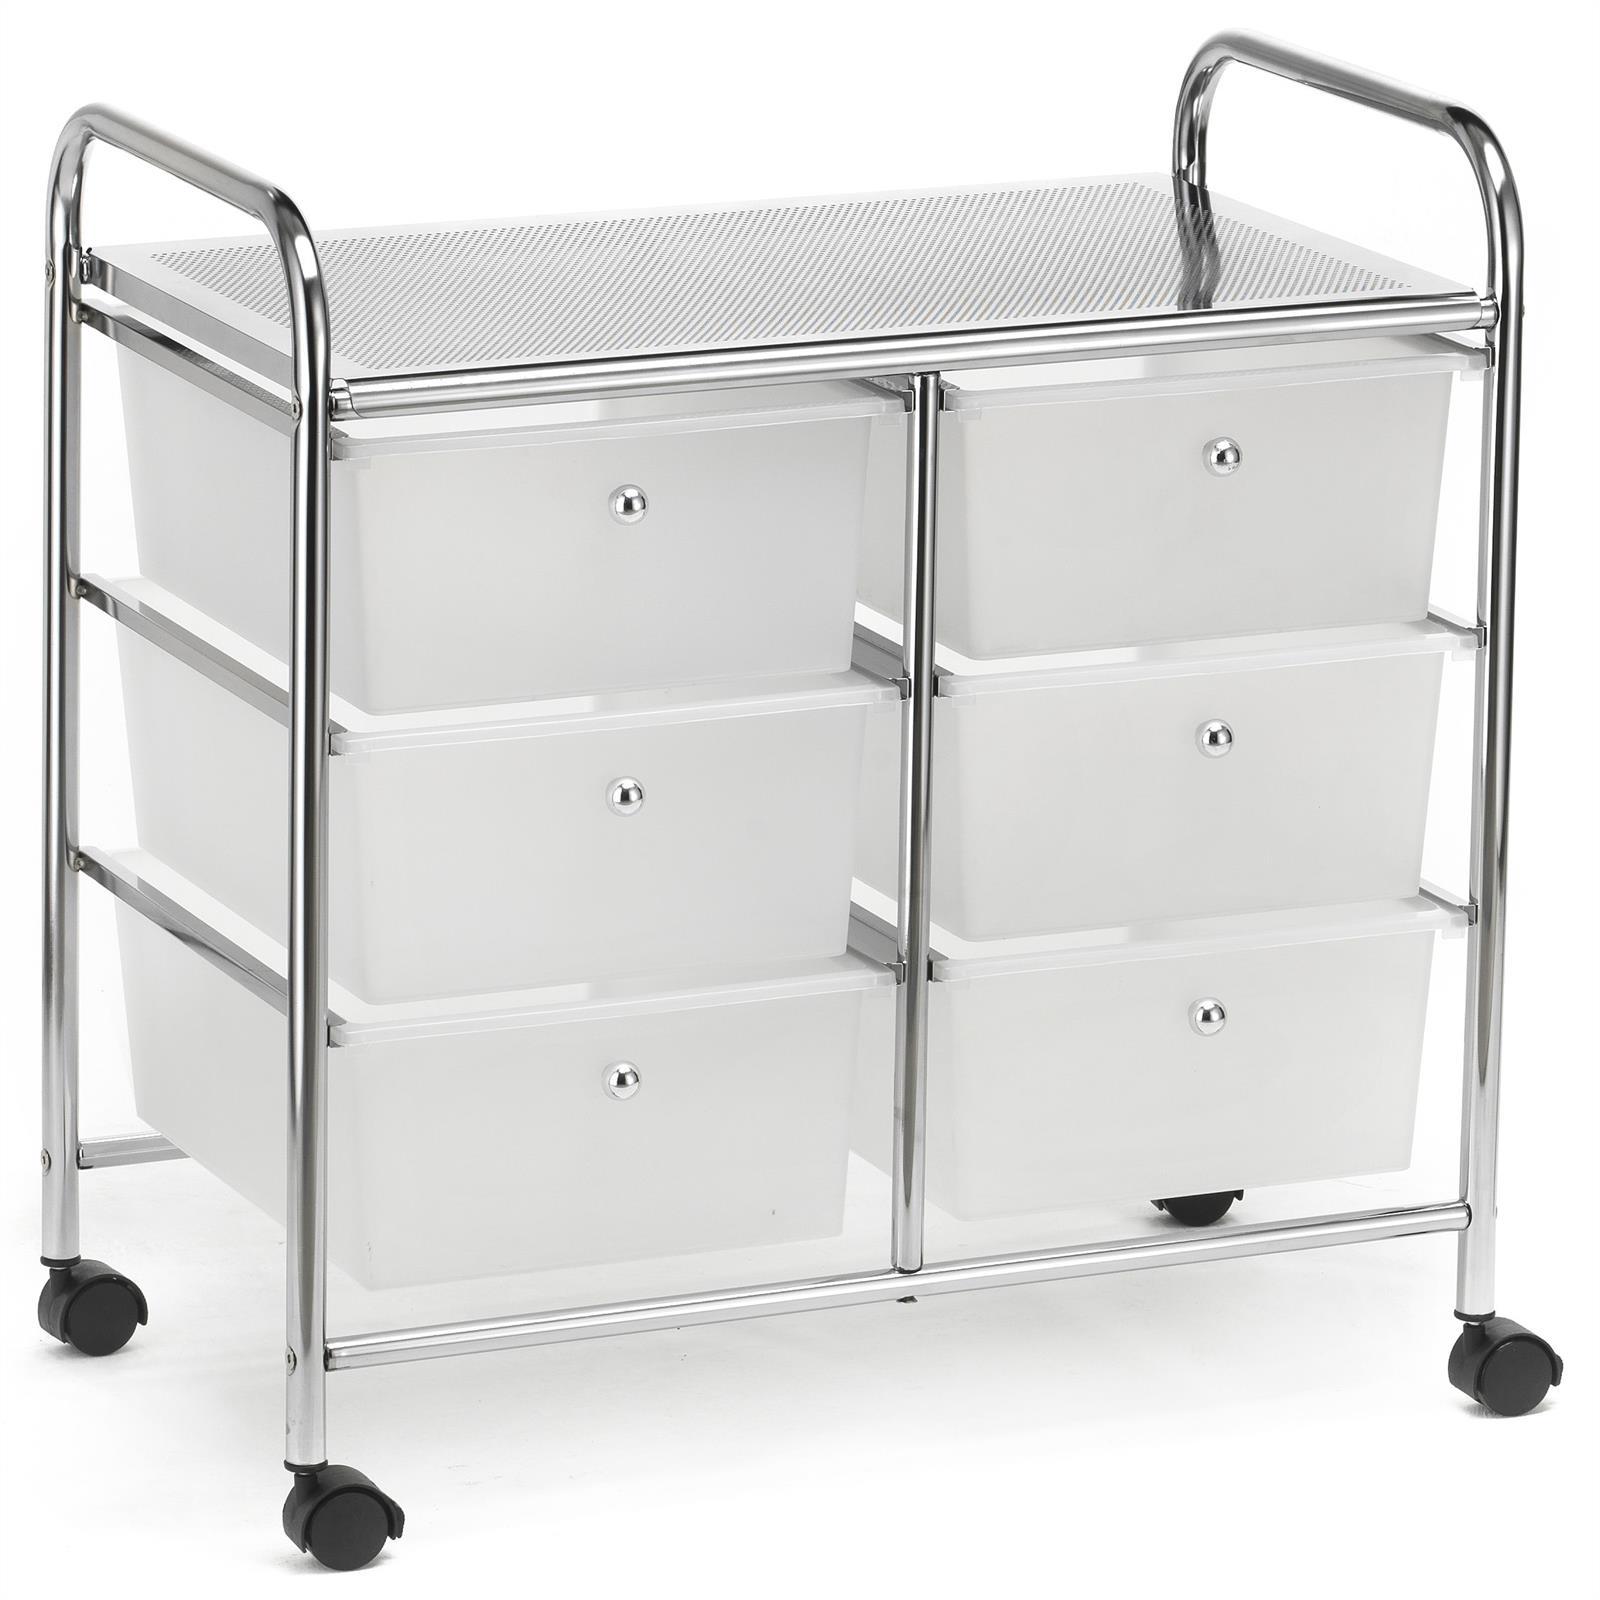 rollcontainer gina mit 3 3 schubladen mobilia24. Black Bedroom Furniture Sets. Home Design Ideas